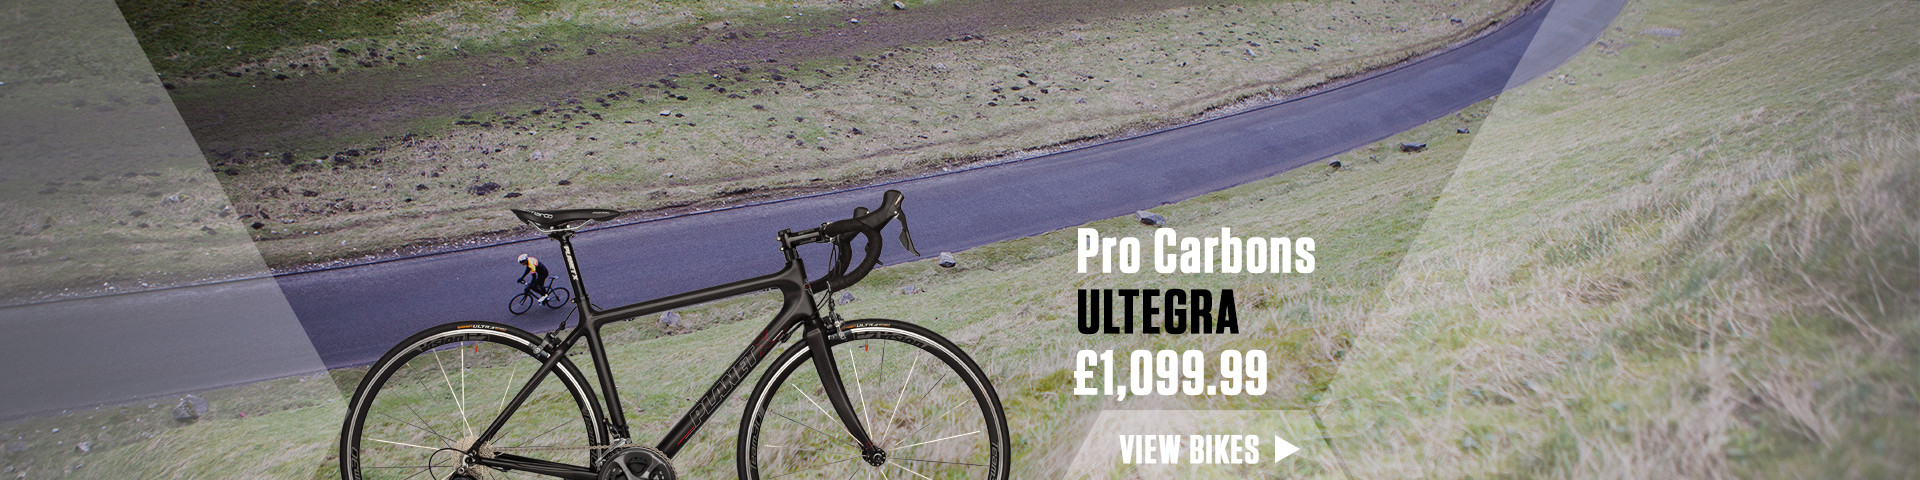 Pro Carbon Ultegra